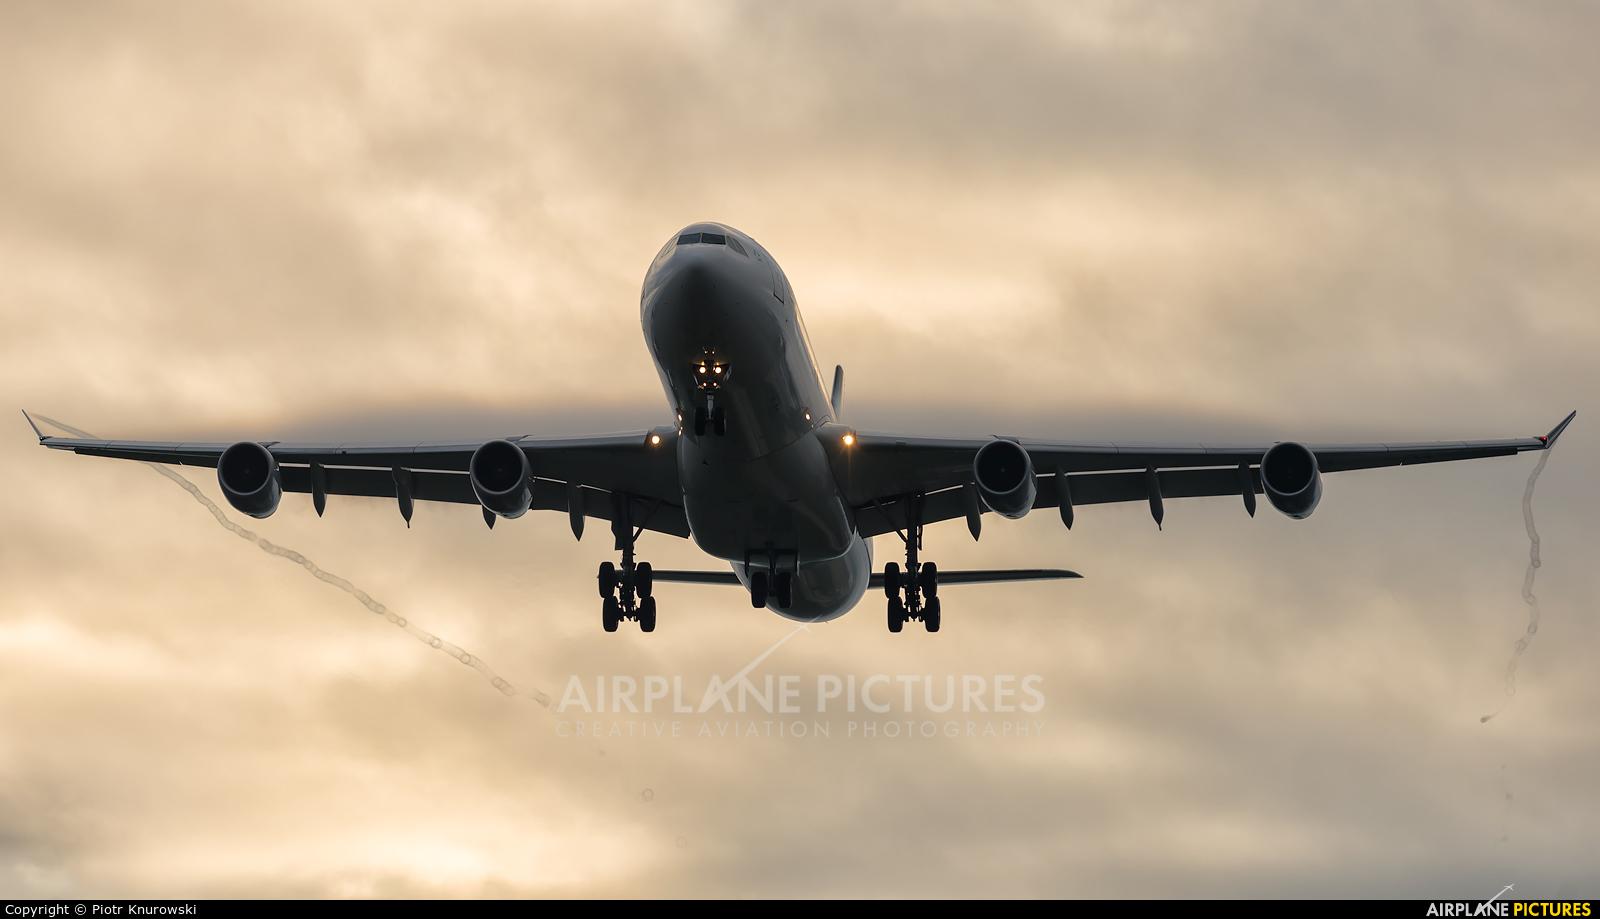 Lufthansa D-AIGP aircraft at Frankfurt